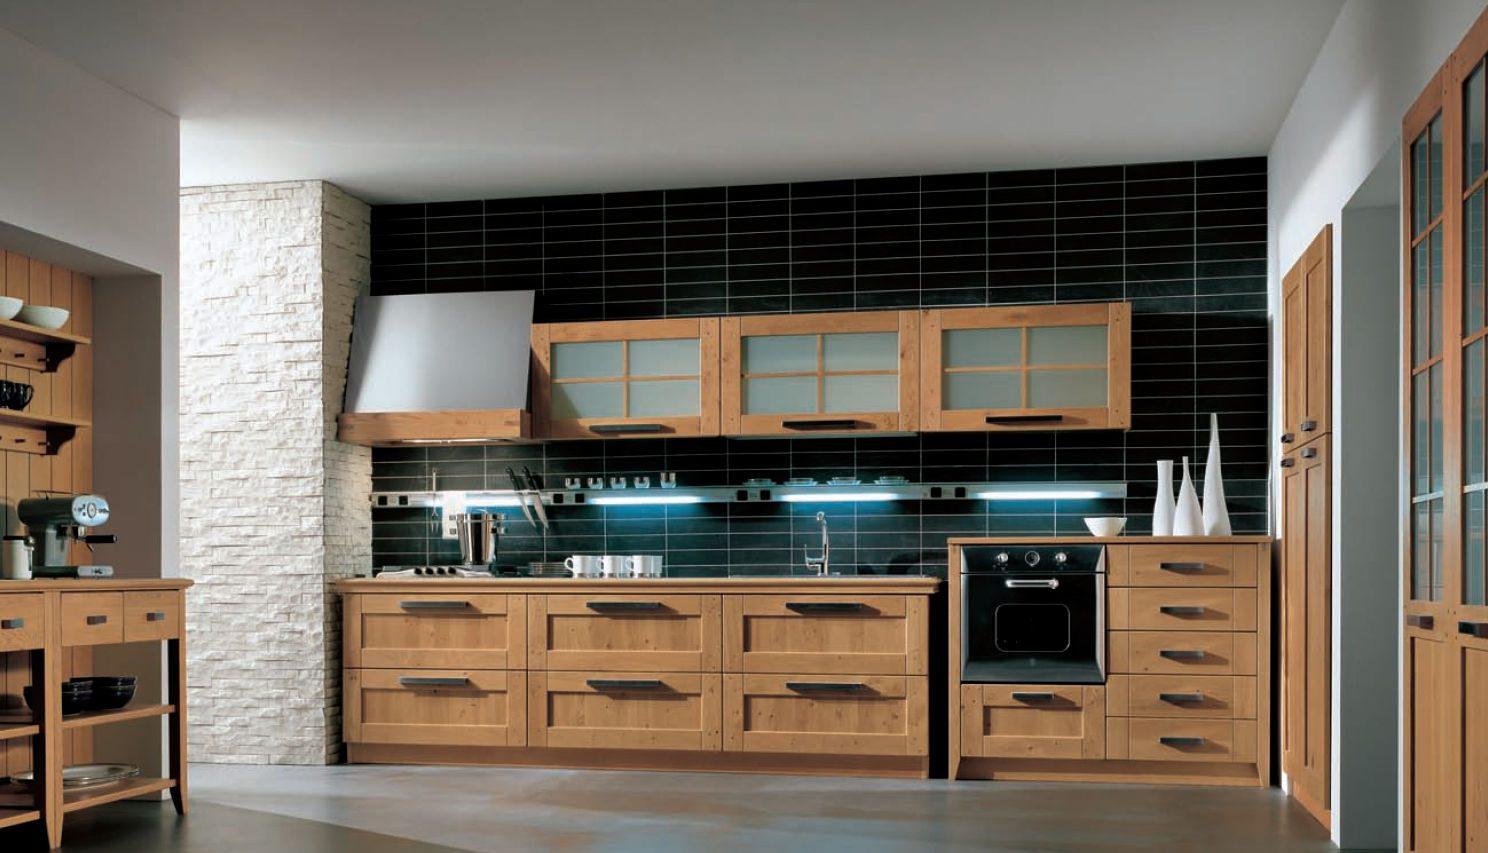 De reposteros para cocinas modernas con desayunador for Muebles de cocina de madera